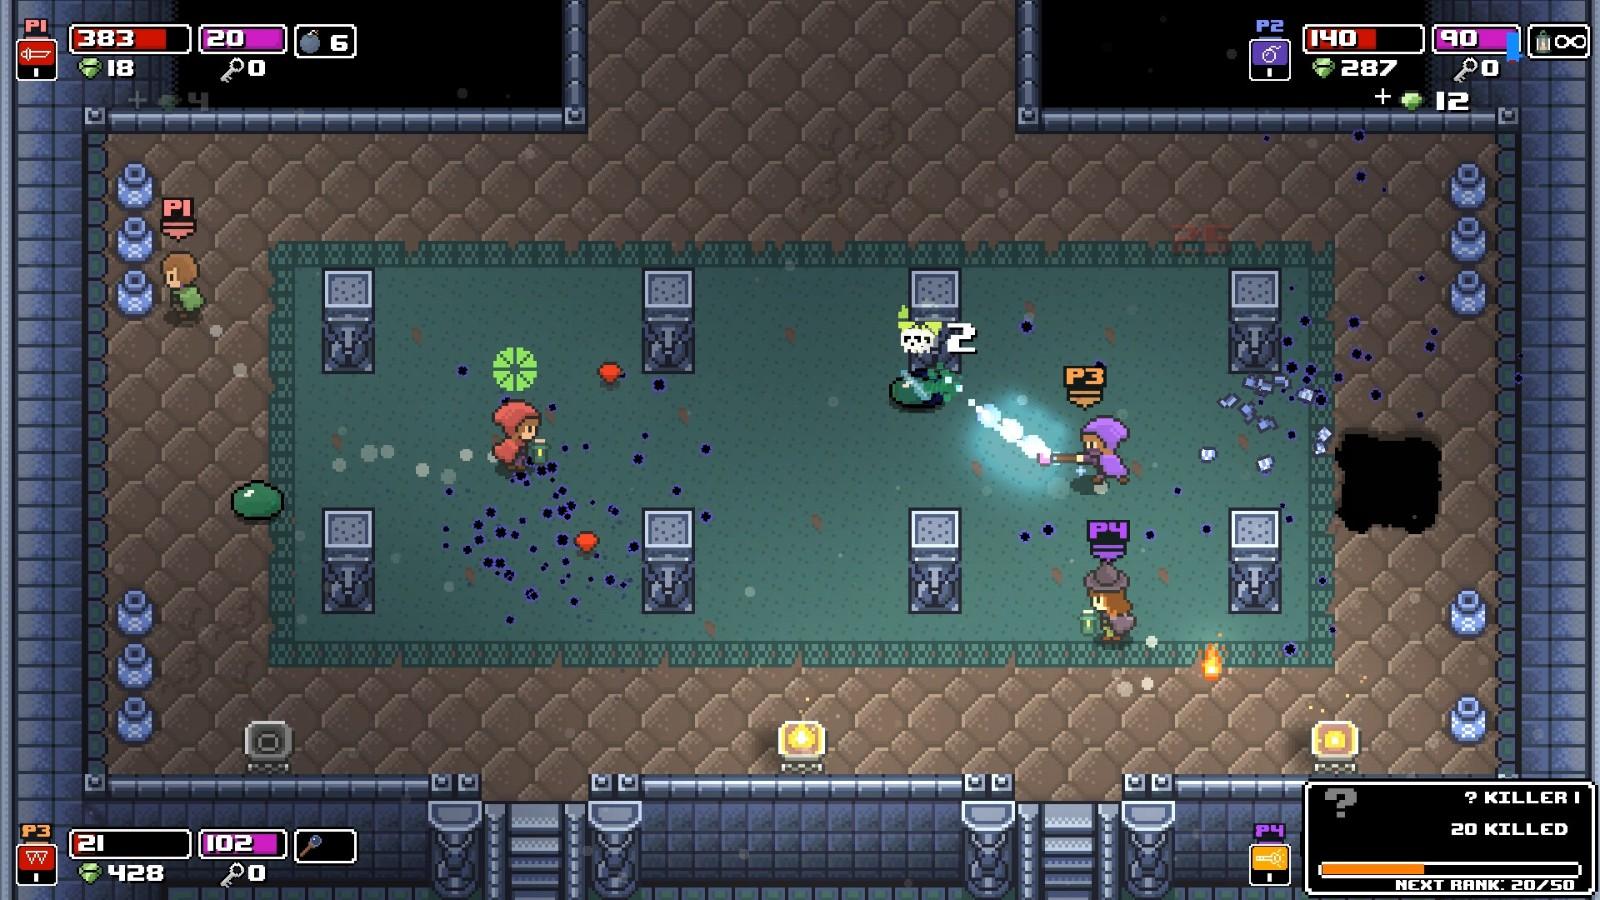 Roguelite游戏《痞子英雄:泰索斯遗迹》2月23日发售 试玩版已上线